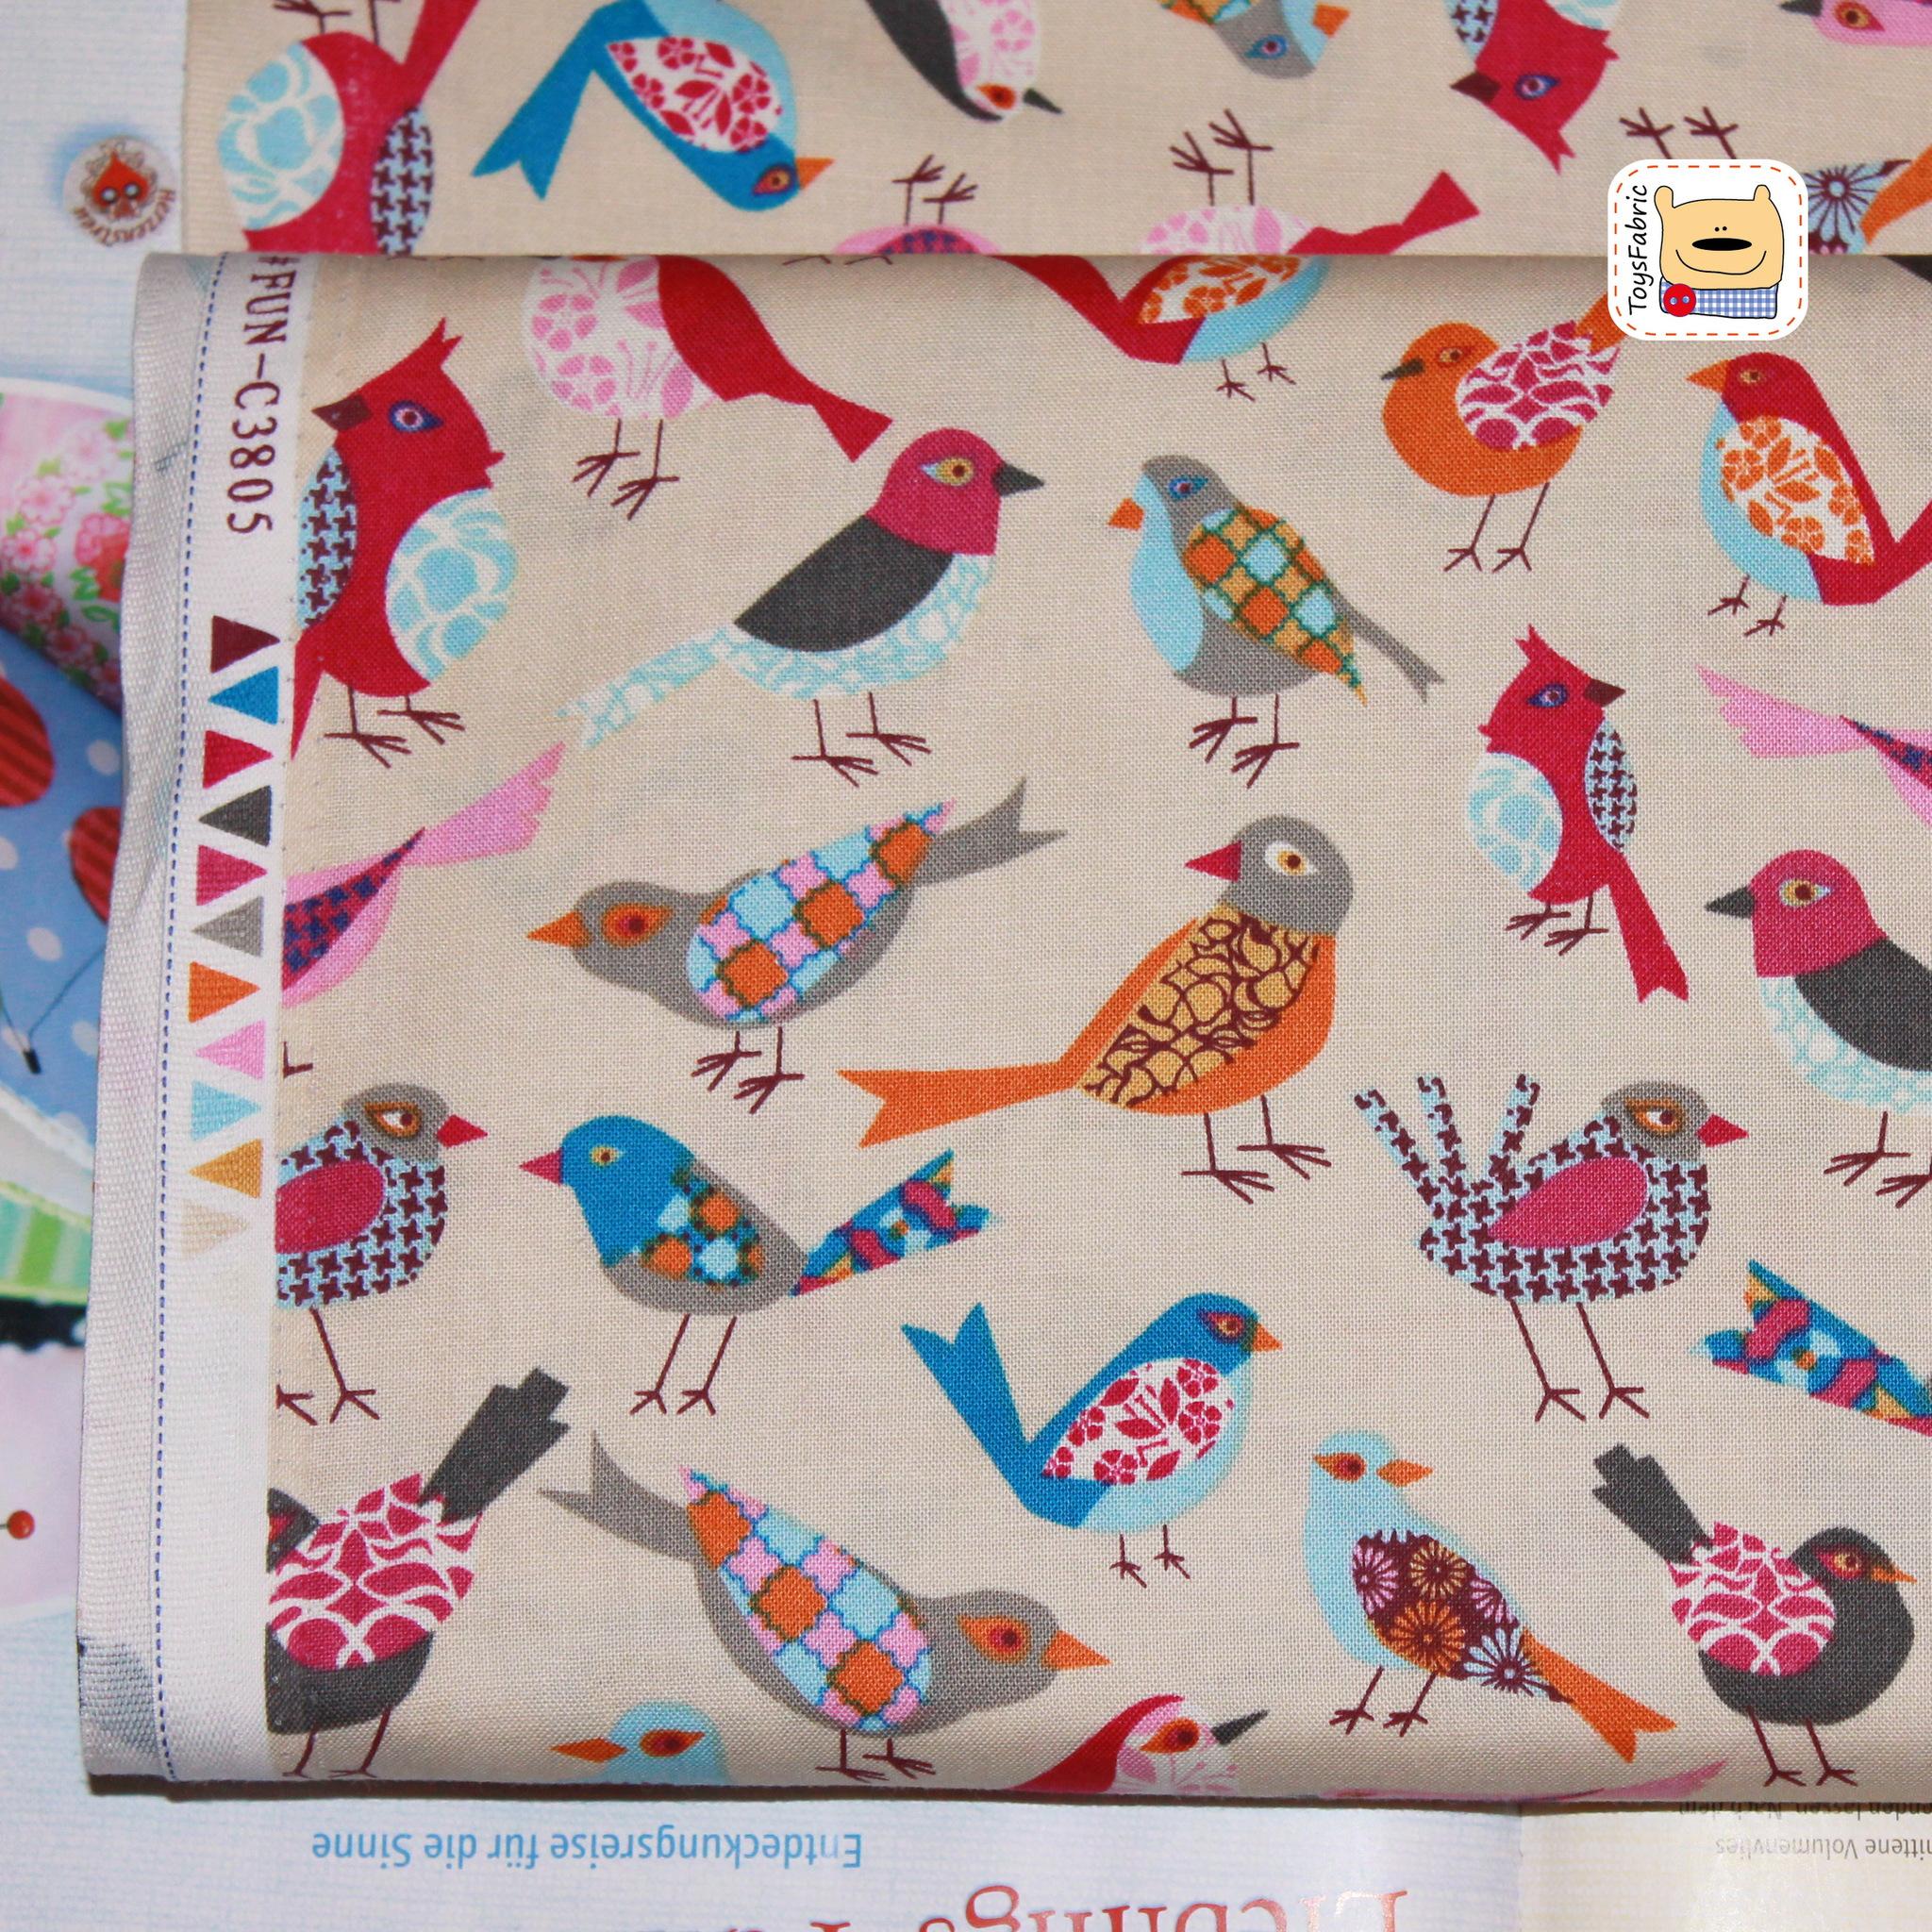 Ткань для пэчворка 20373 (птицы лоскутные) 45х55см